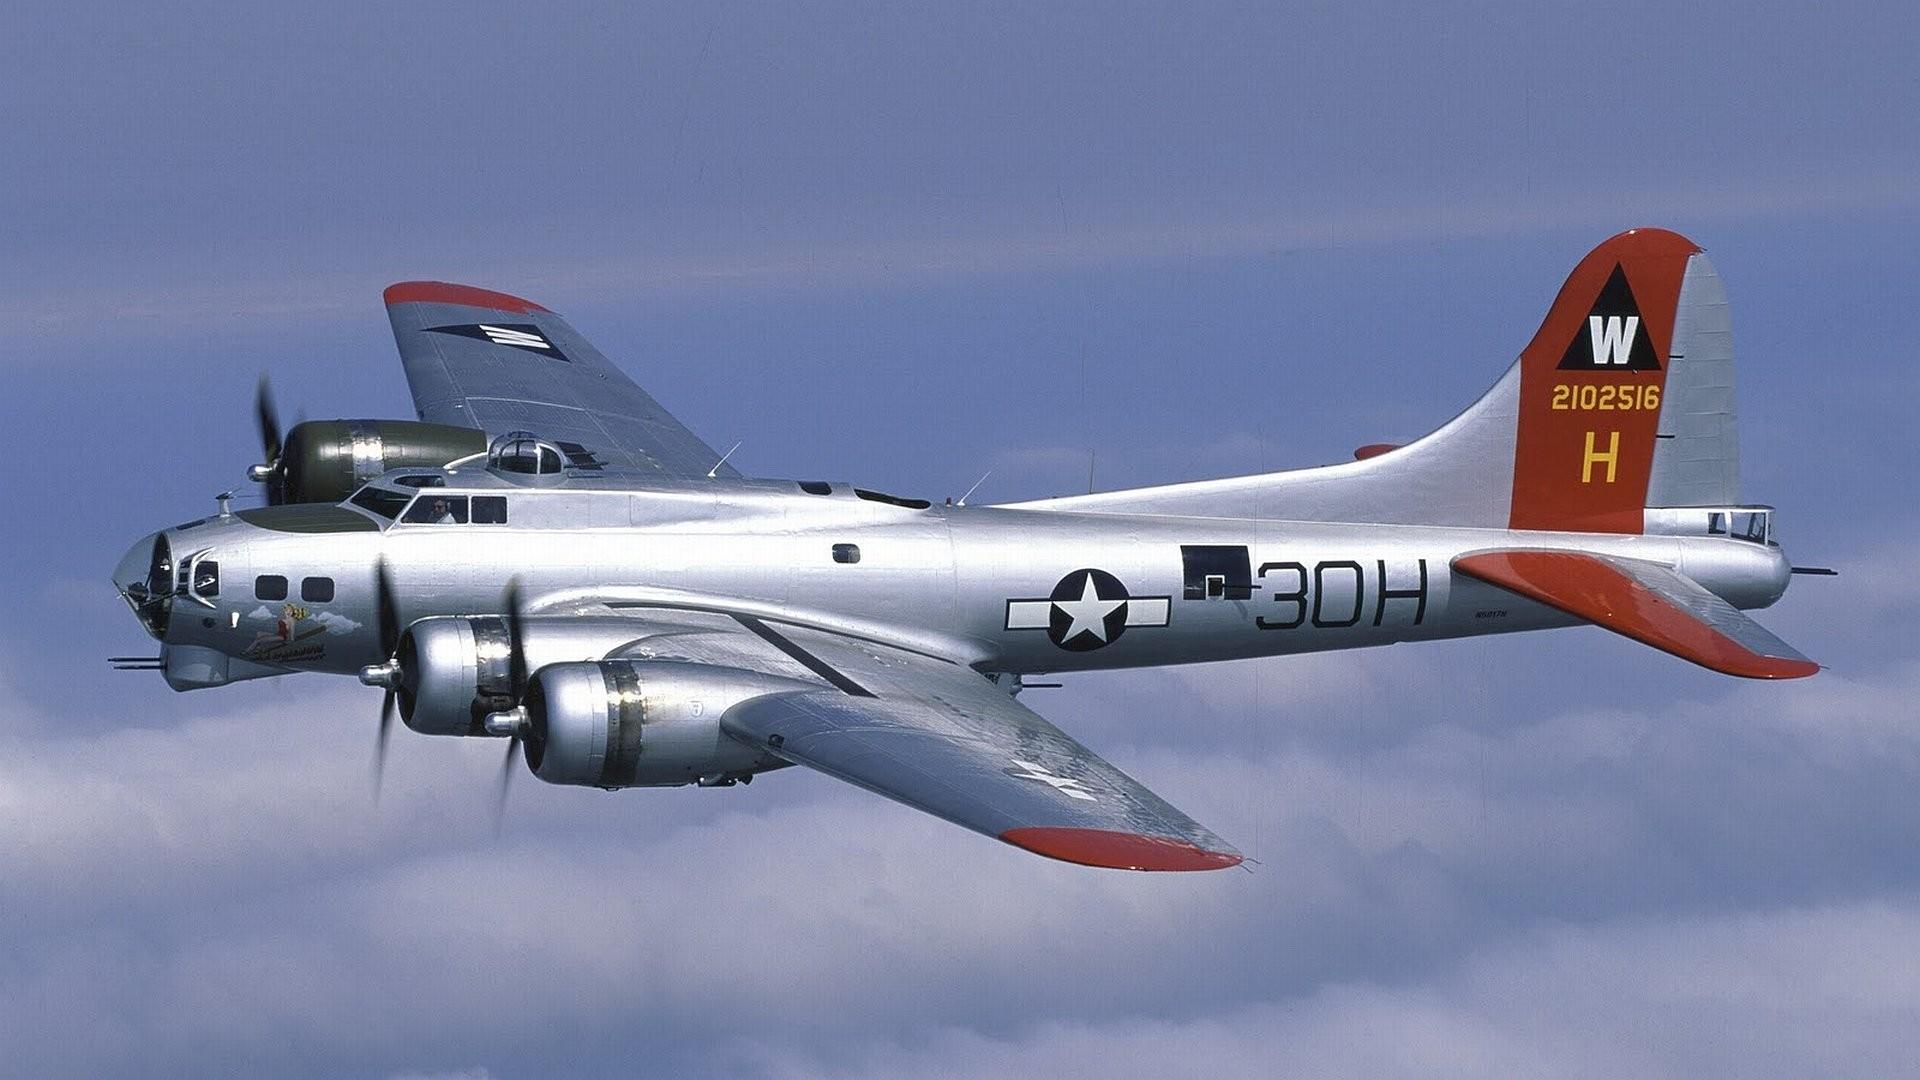 B 17 Bomber 821733 · boeing b-17 flying fortress 720344